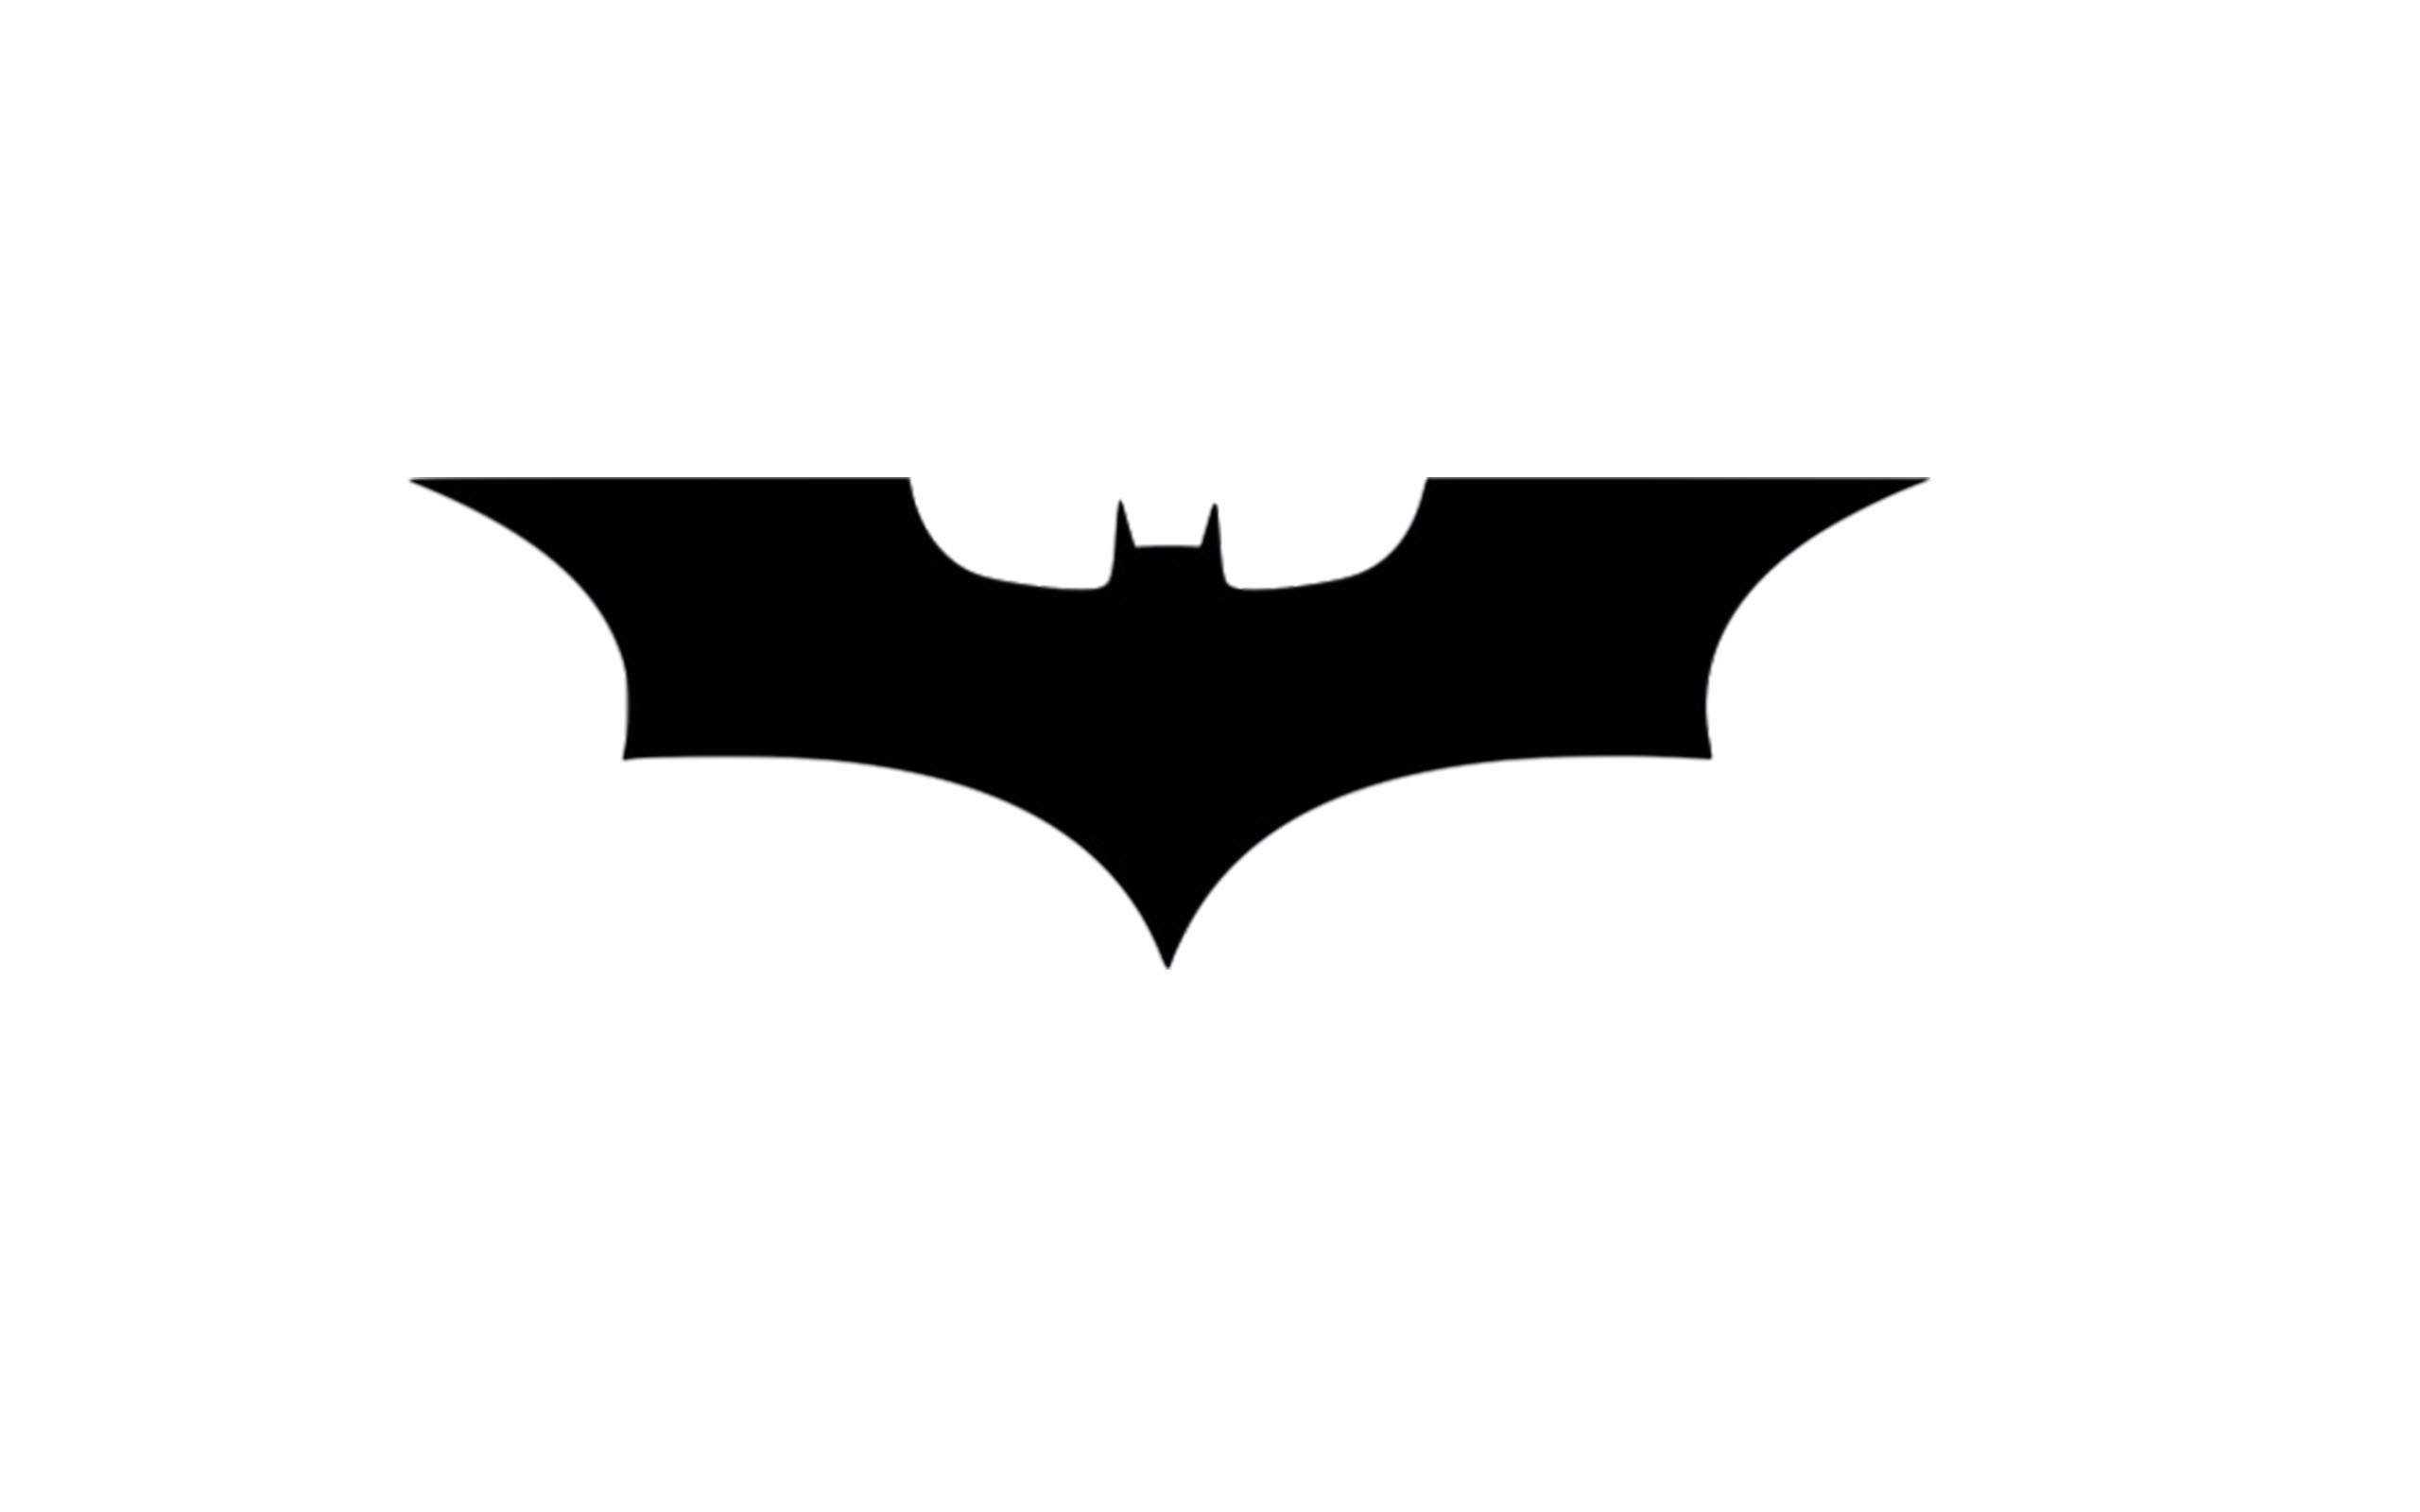 Batman Black And White Logo Black And White Logos Black And White Batman Wallpaper